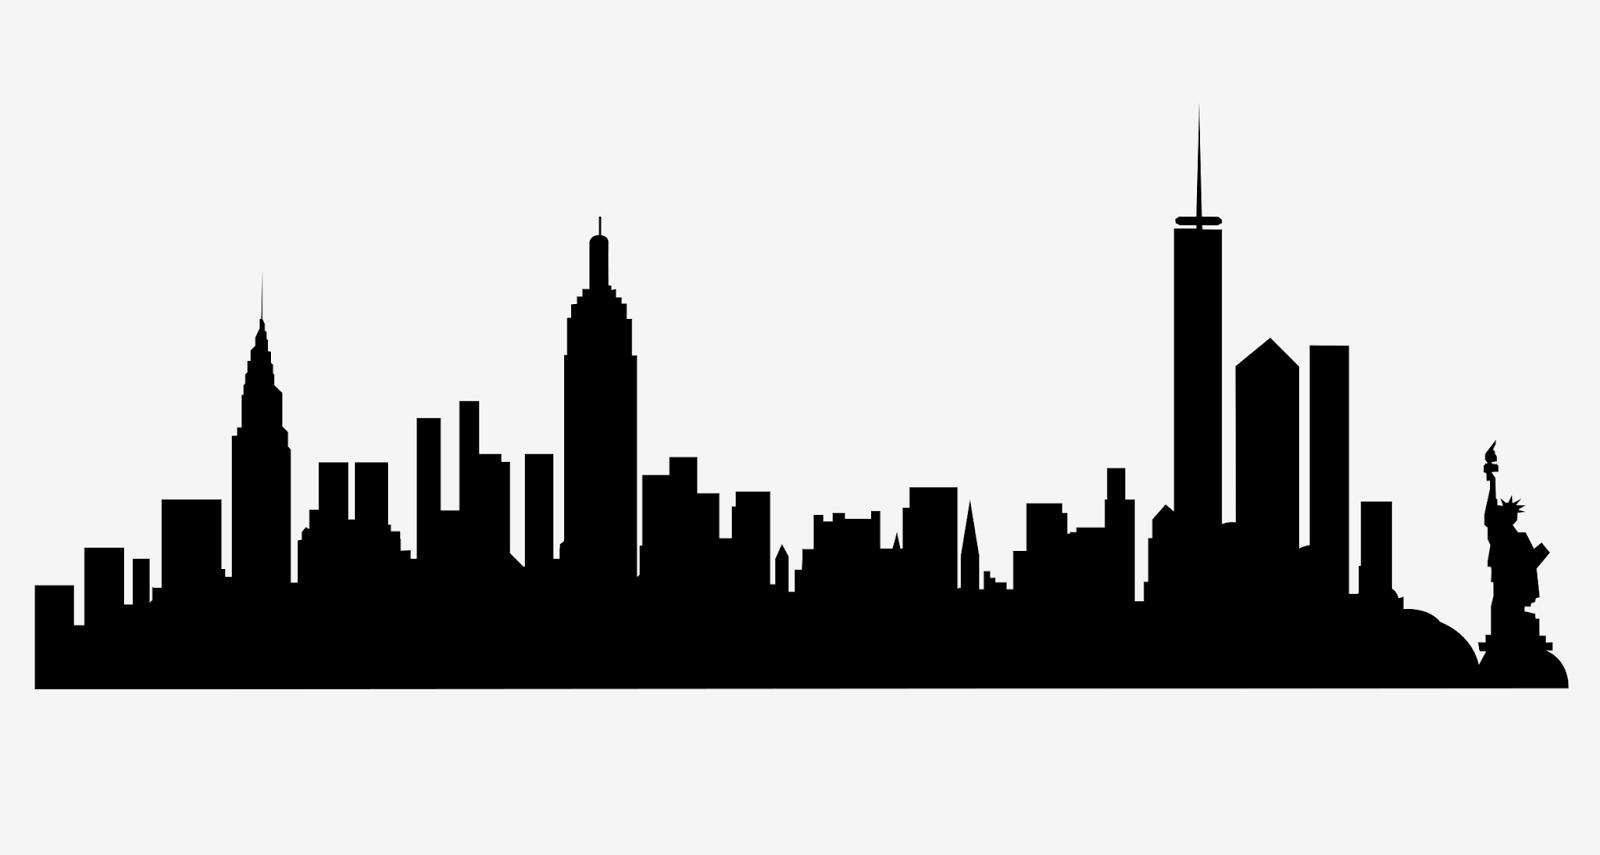 New York City Skyline Silhouette Free Svg Nel 2020 Sfondi Silhouette Grattacieli